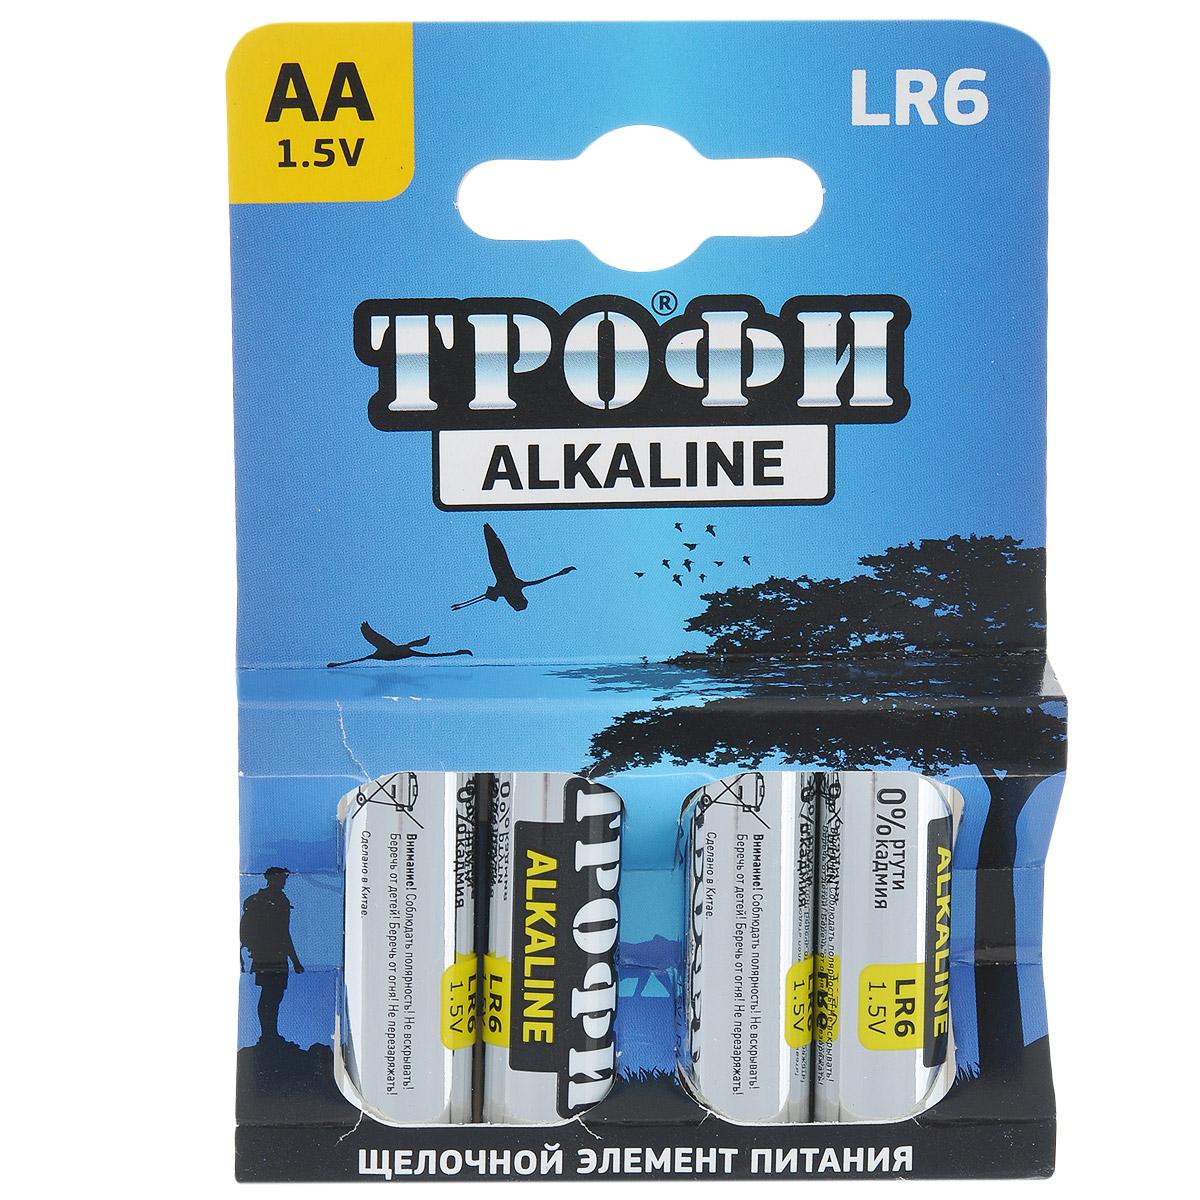 Батарейка алкалиновая Трофи, тип AA (LR6-4BL), 1,5В, 4 шт